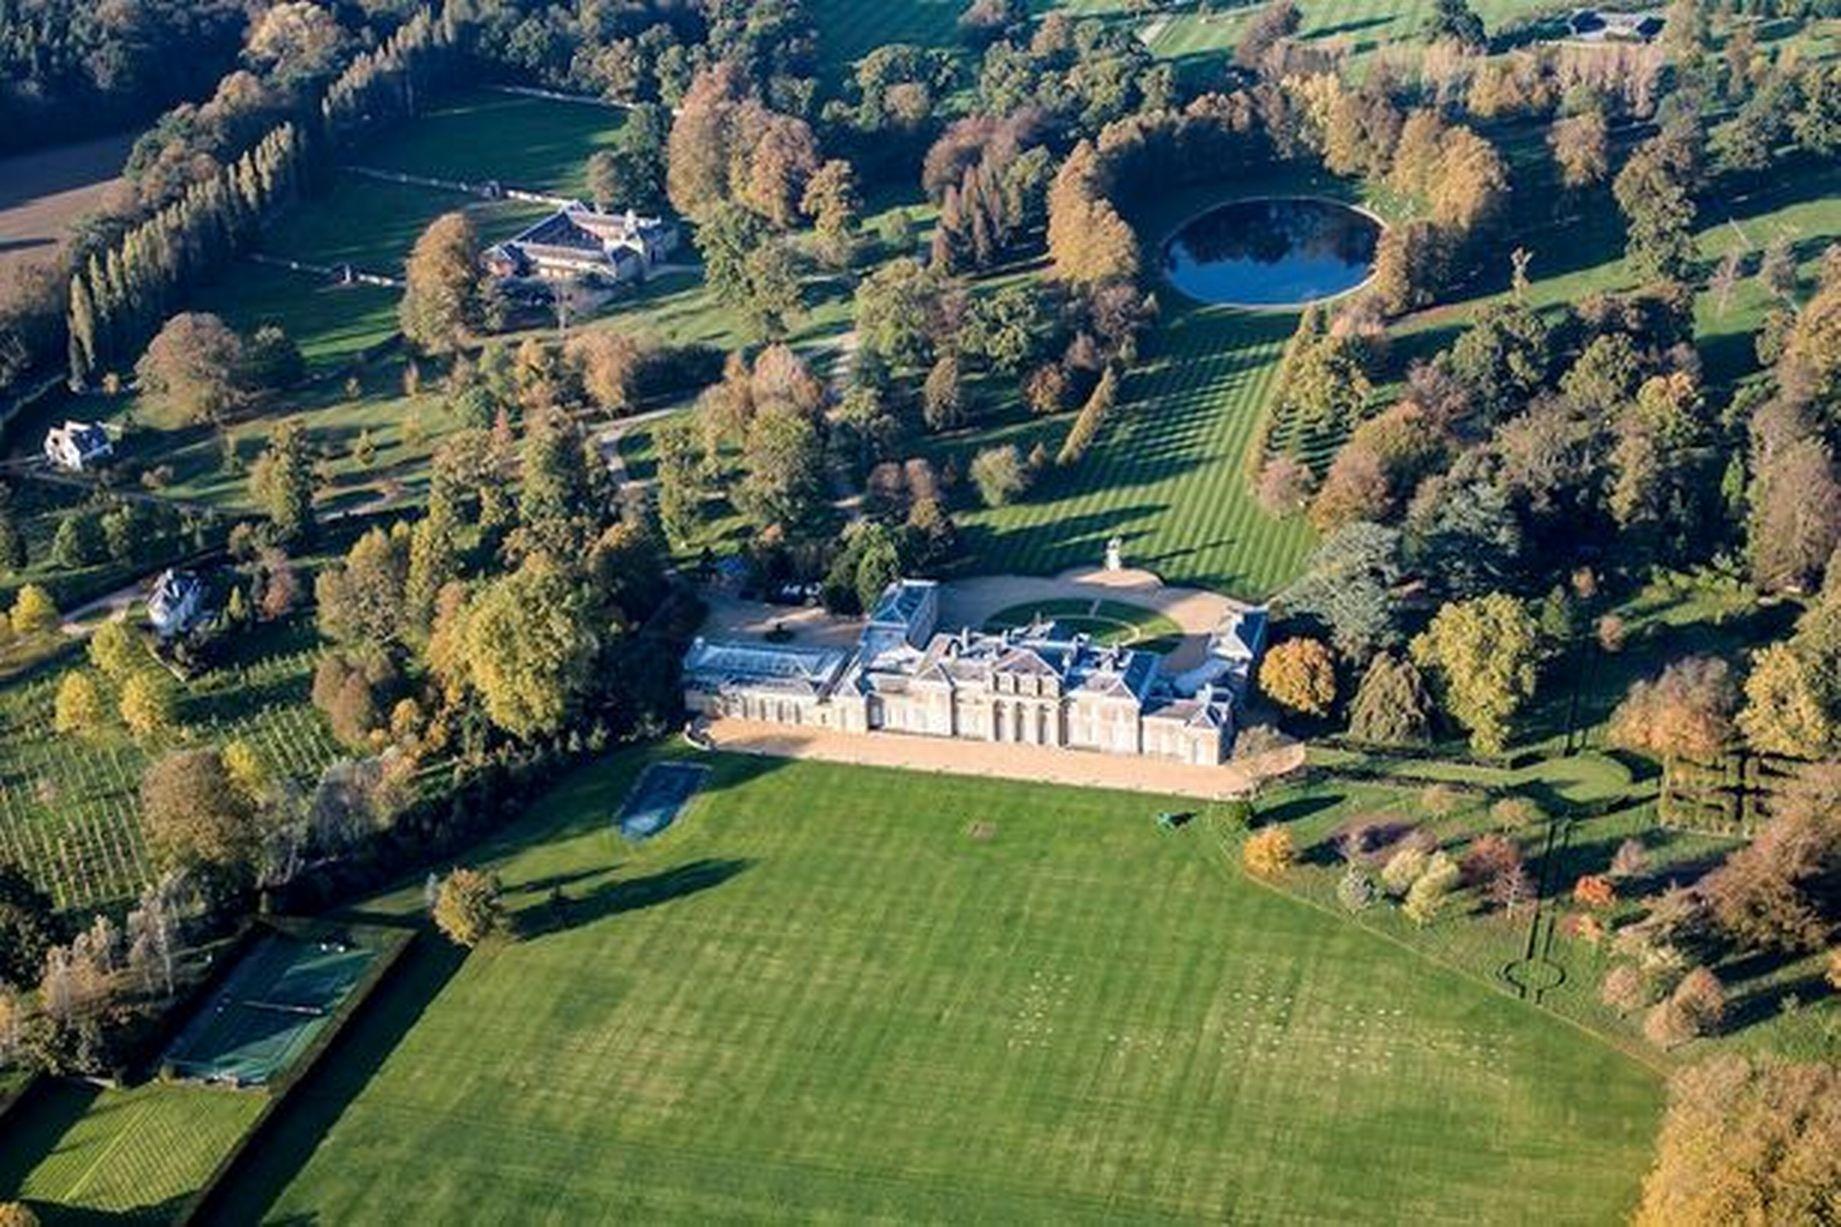 Hackwood Park Alton Basingstoke, AngleterreC